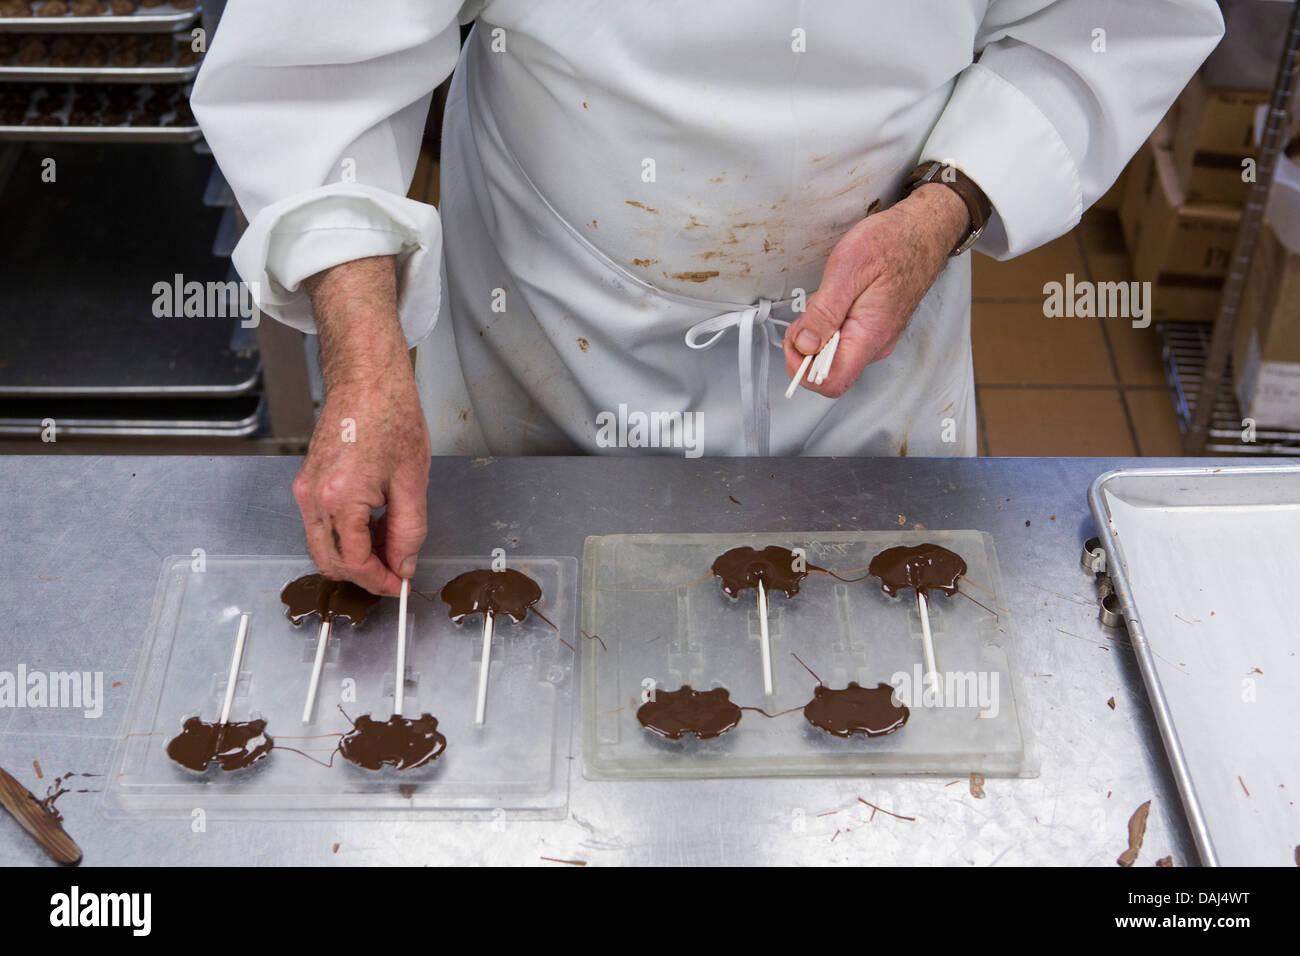 Chocolate Factory Production Stockfotos & Chocolate Factory ...